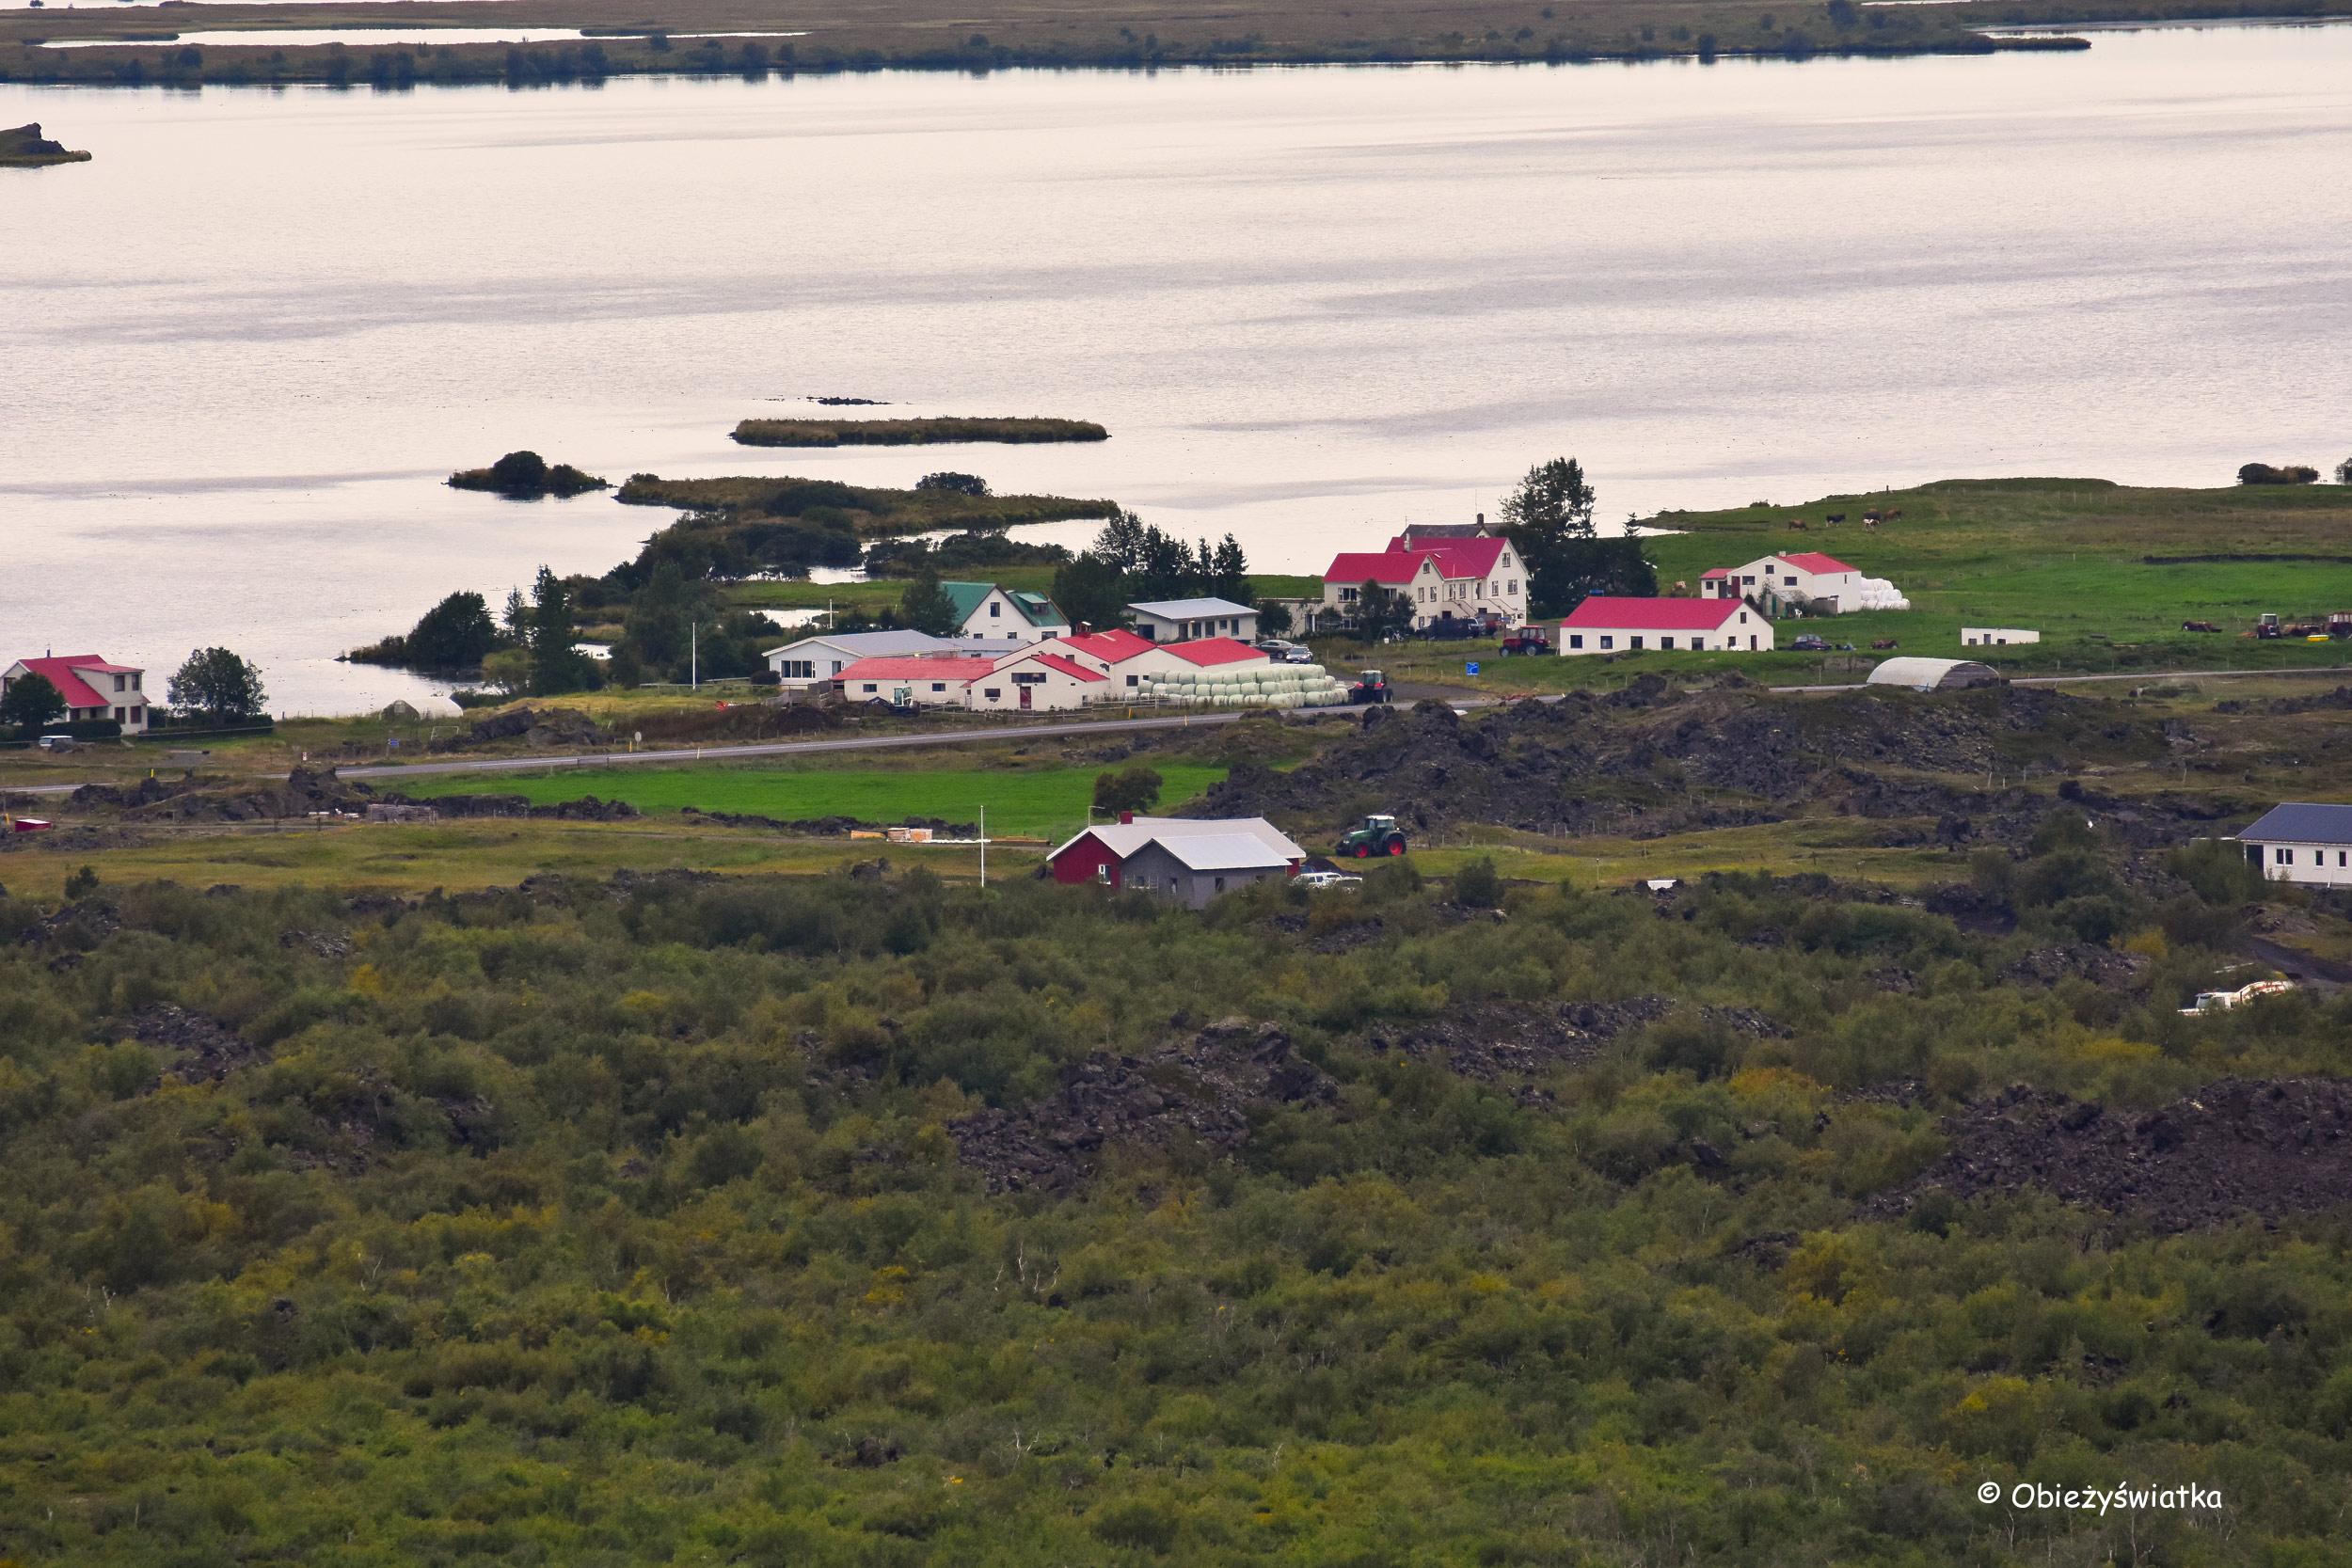 Widok na okolicę z wulkanu Hverfjall, Islandia